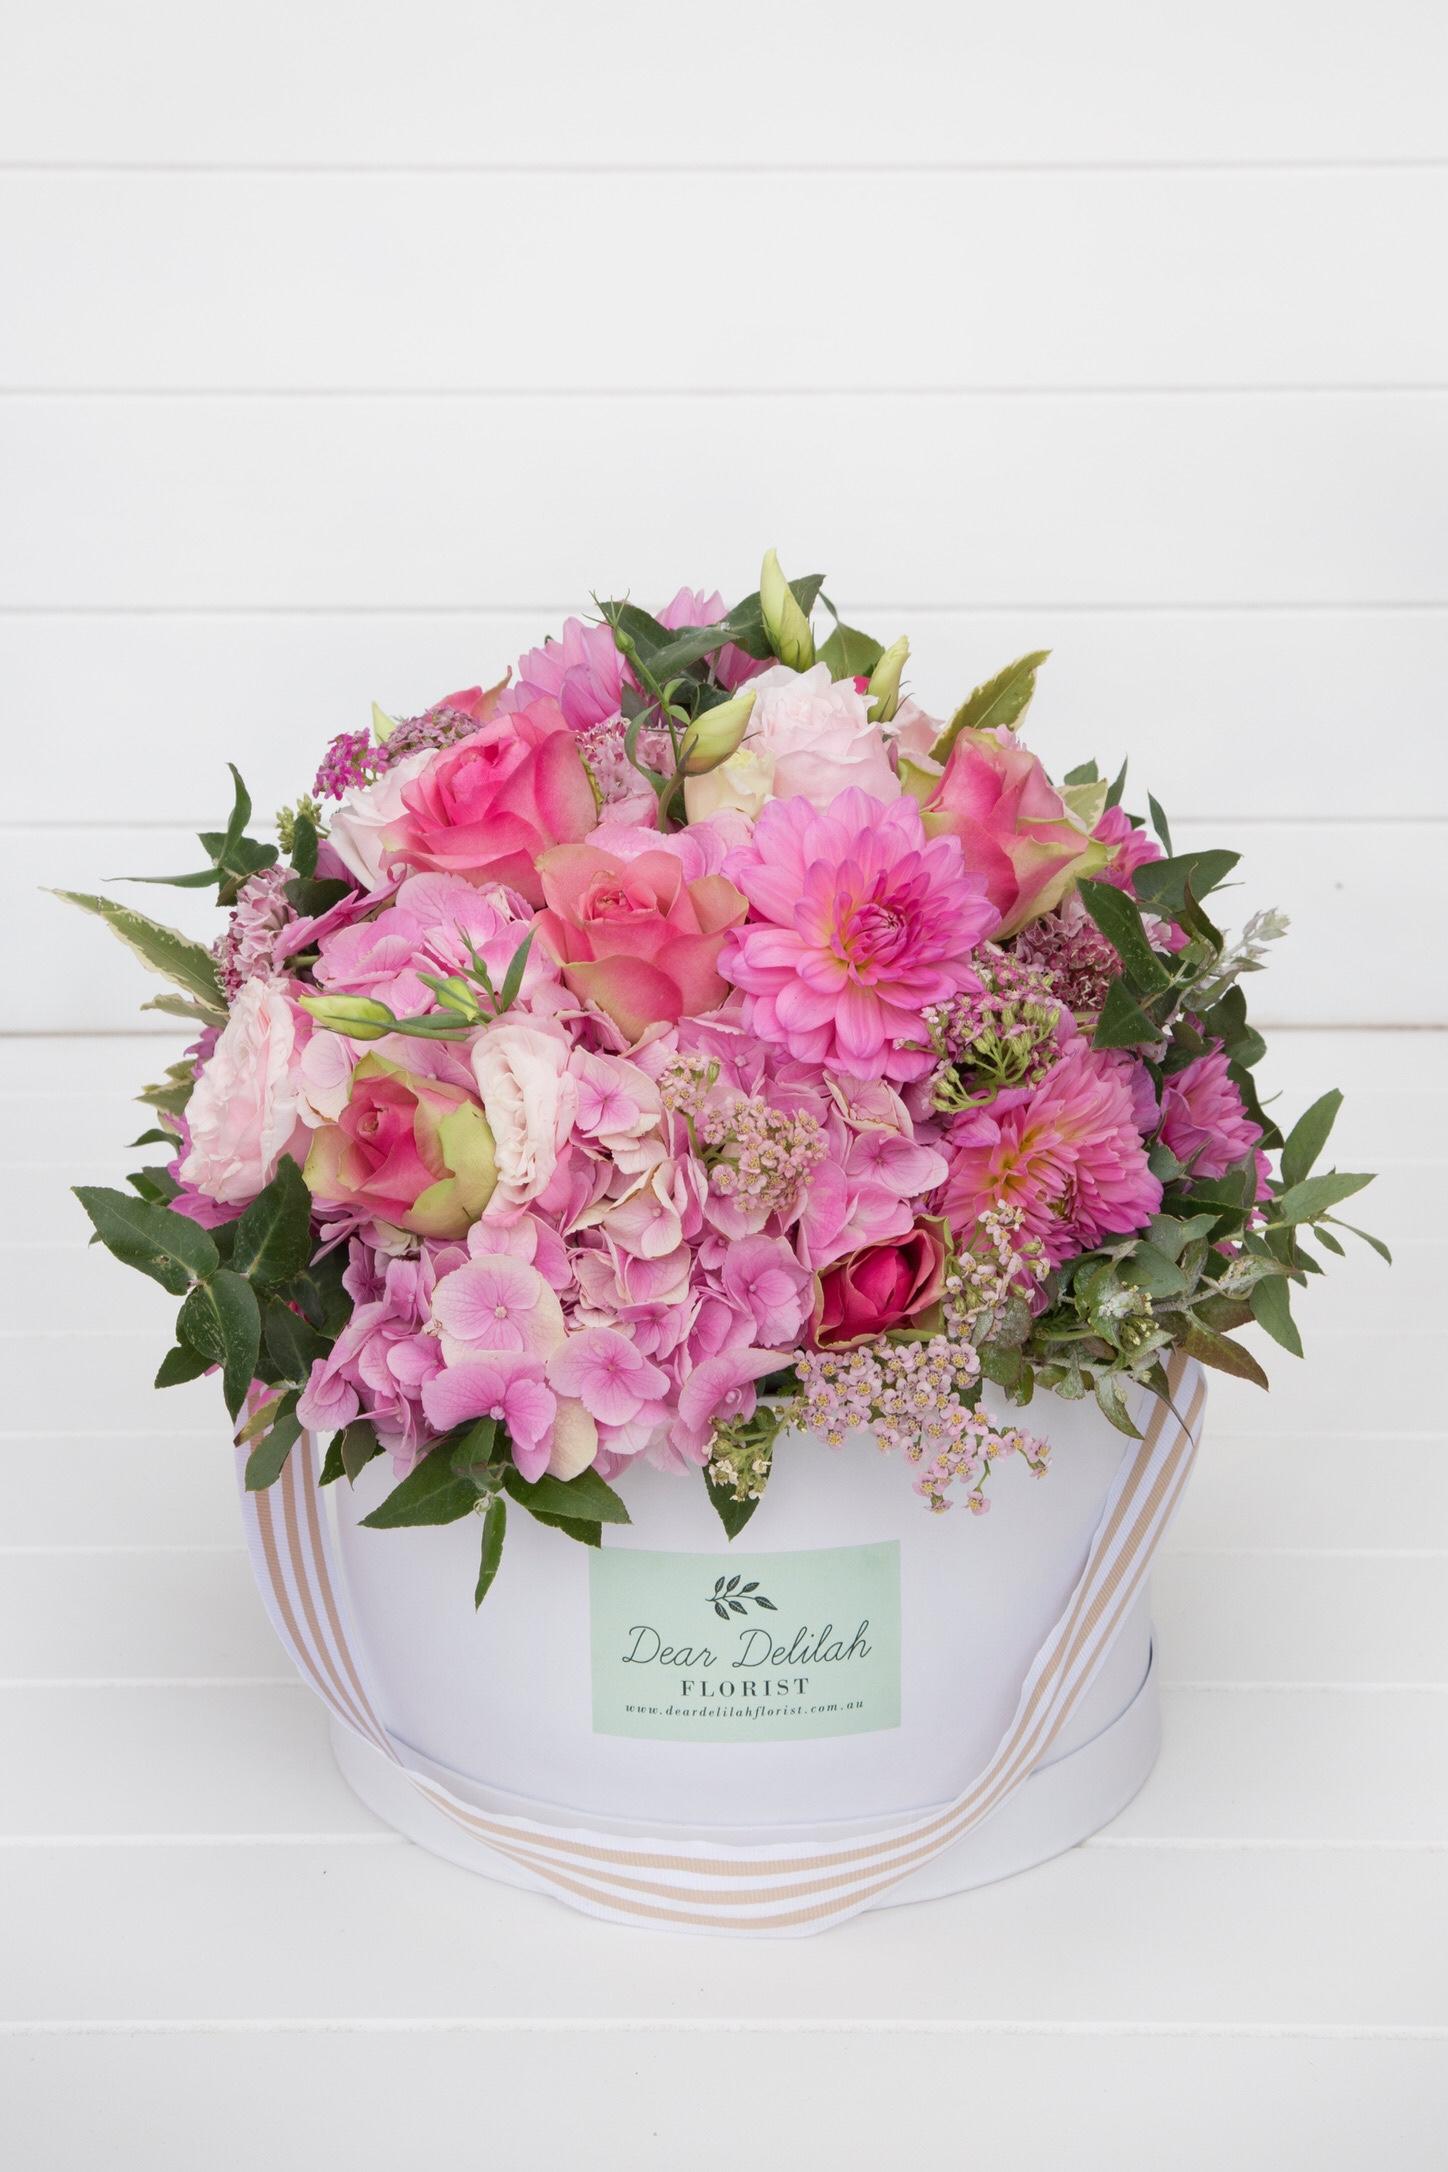 Chic Charlotte | Dear Delilah Florist, Latrobe Valley